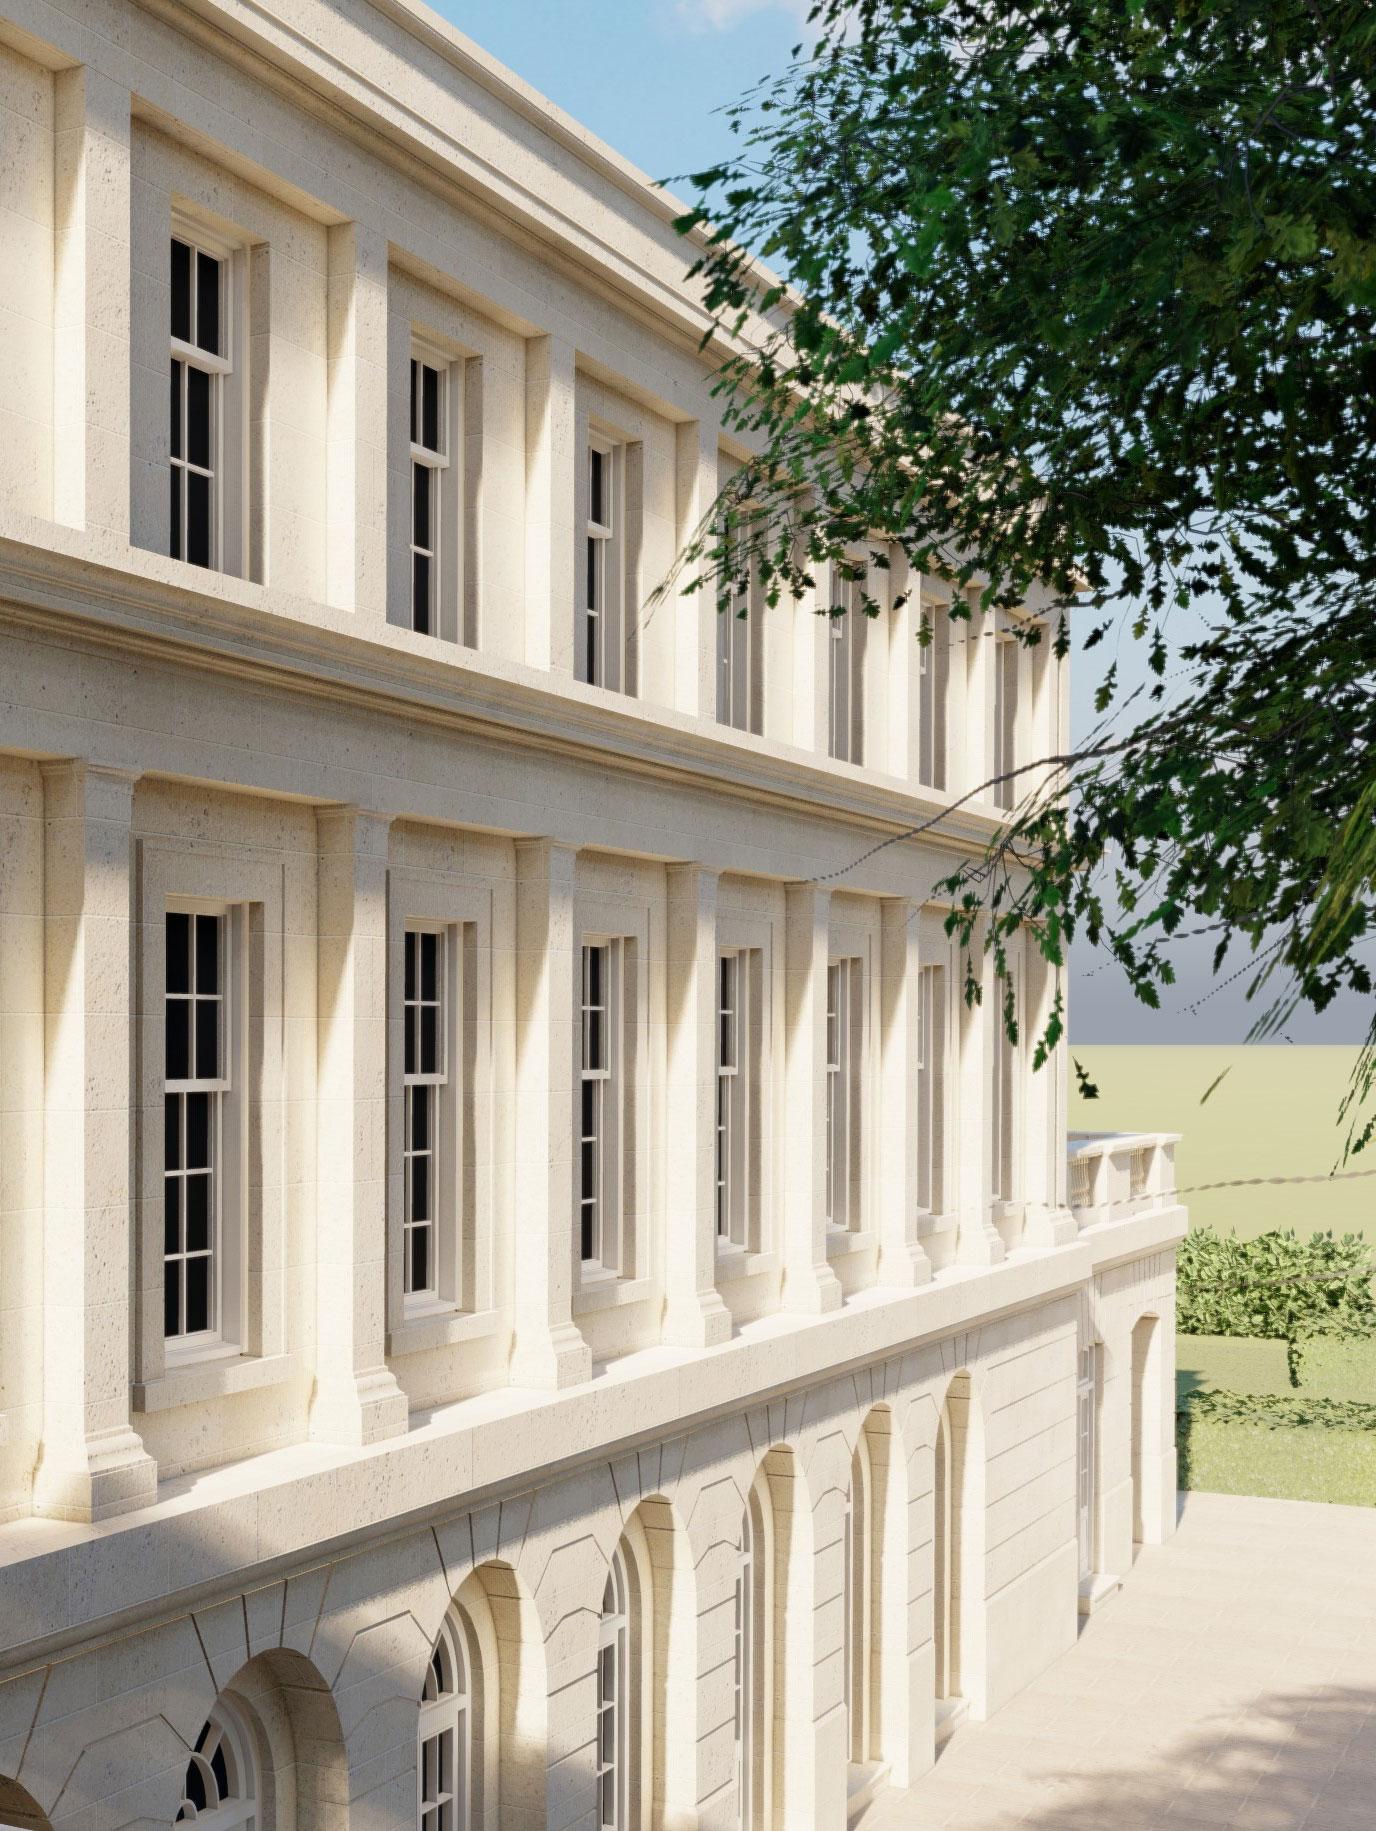 tailleur-de-pierre-stone-masonry